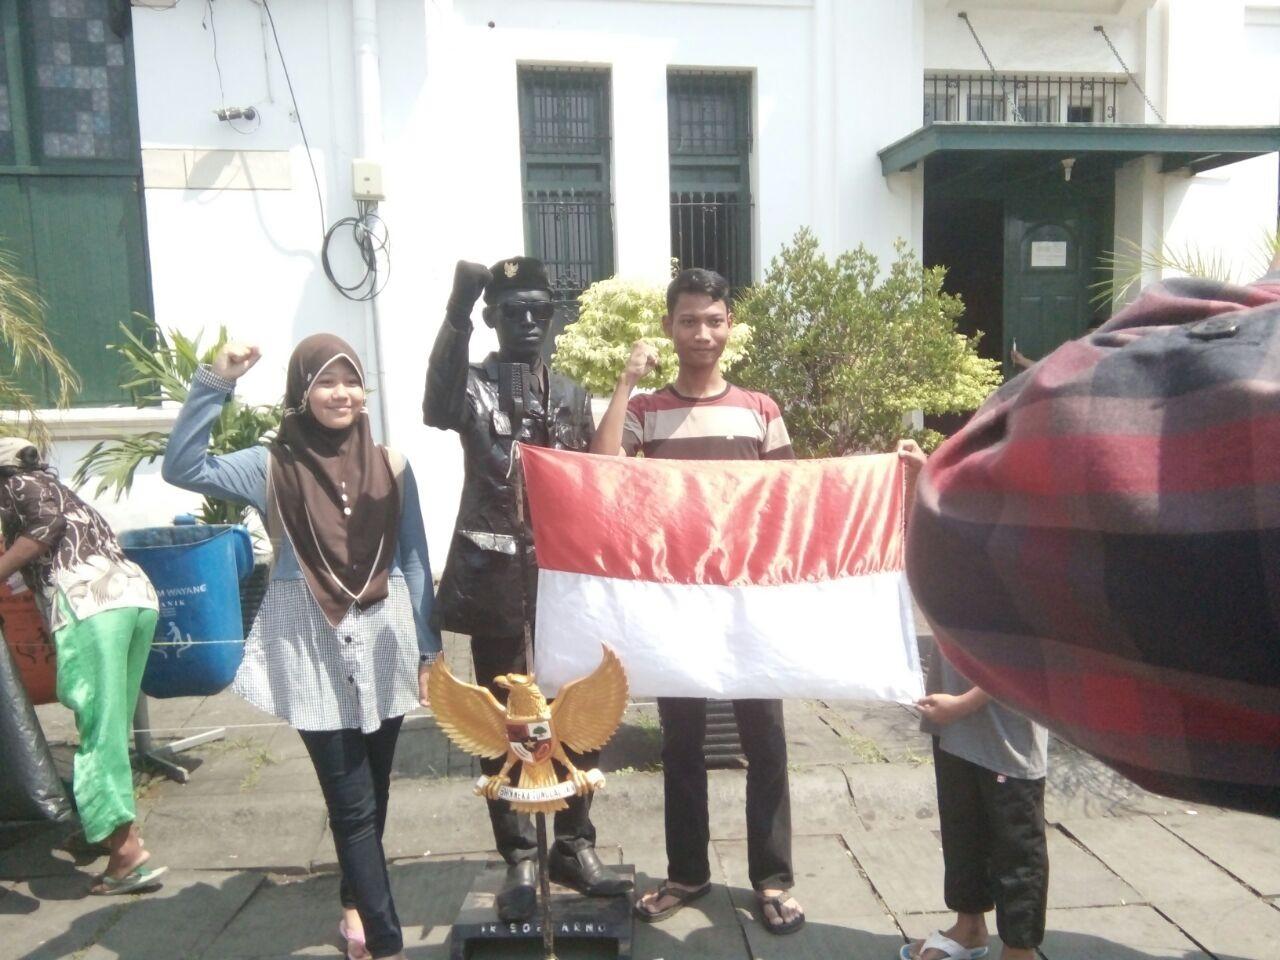 Idul fitri greeting indonesian or arabic way national the idul fitri greeting indonesian or arabic way kristyandbryce Choice Image